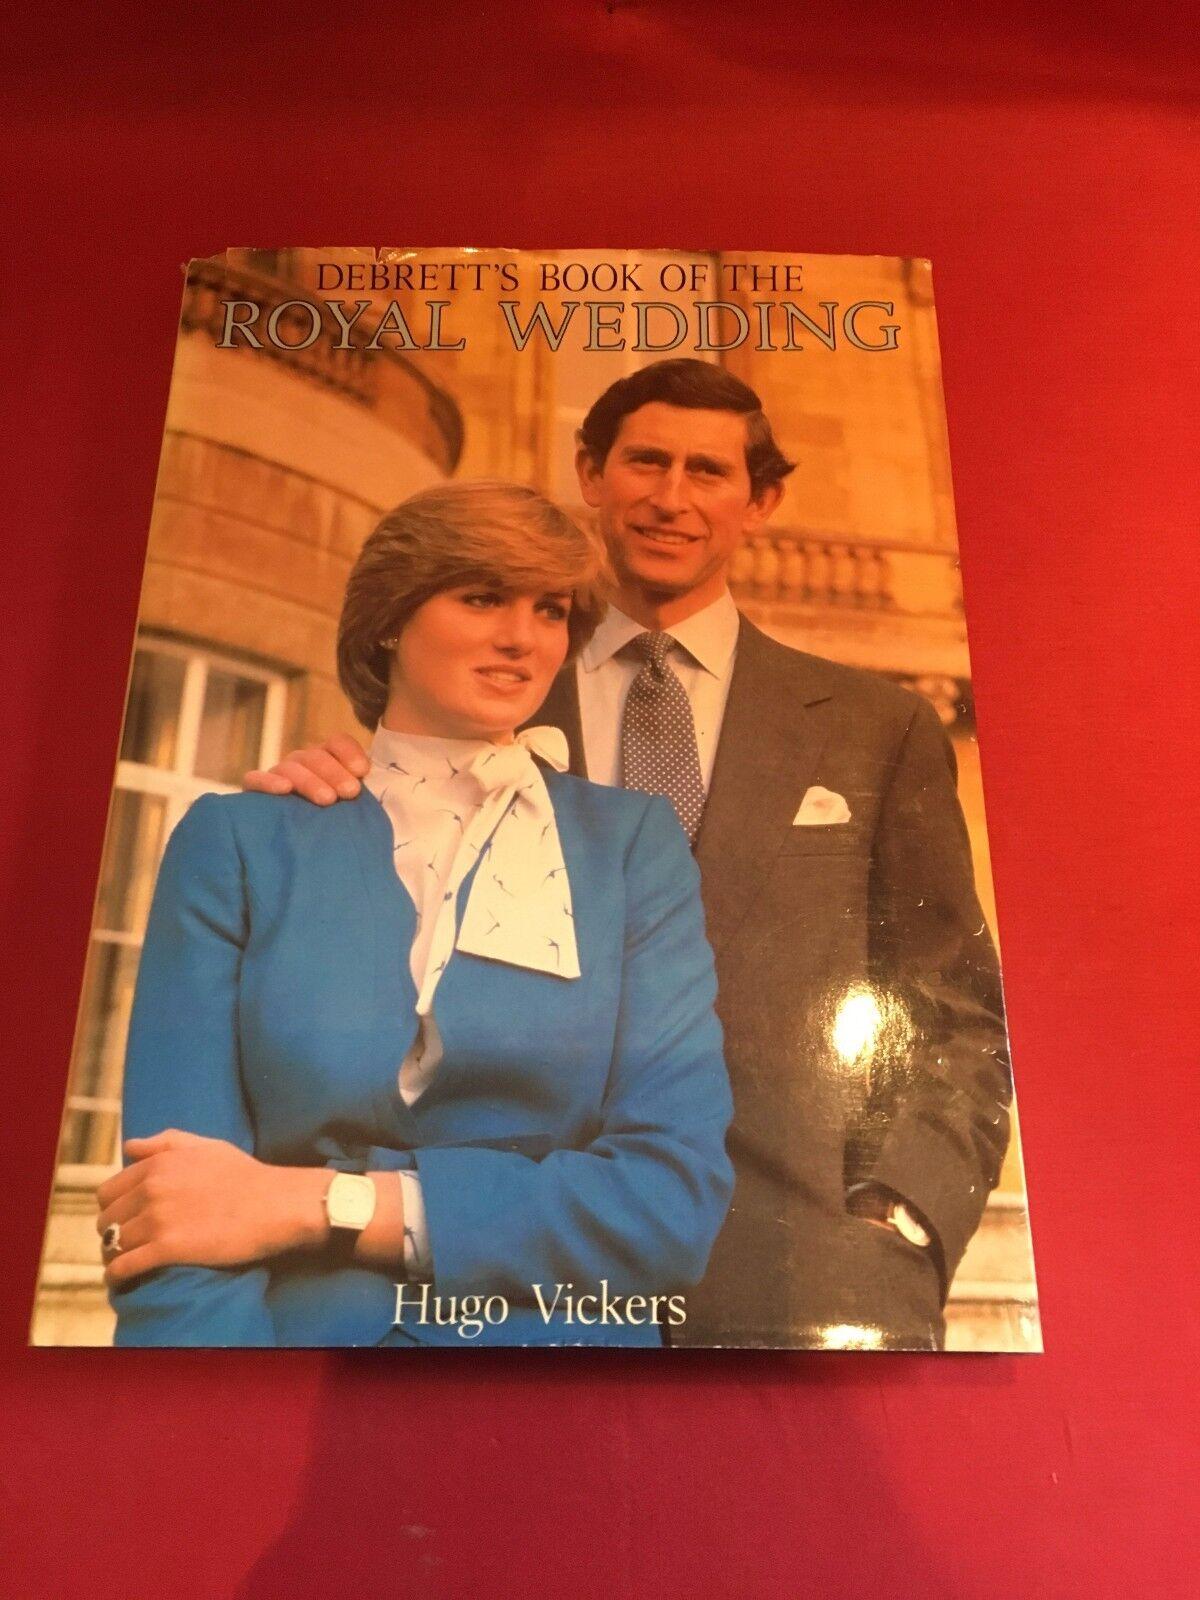 Debrett's Book of The Royal Wedding, Hugo Vickers, 1981 Hardback